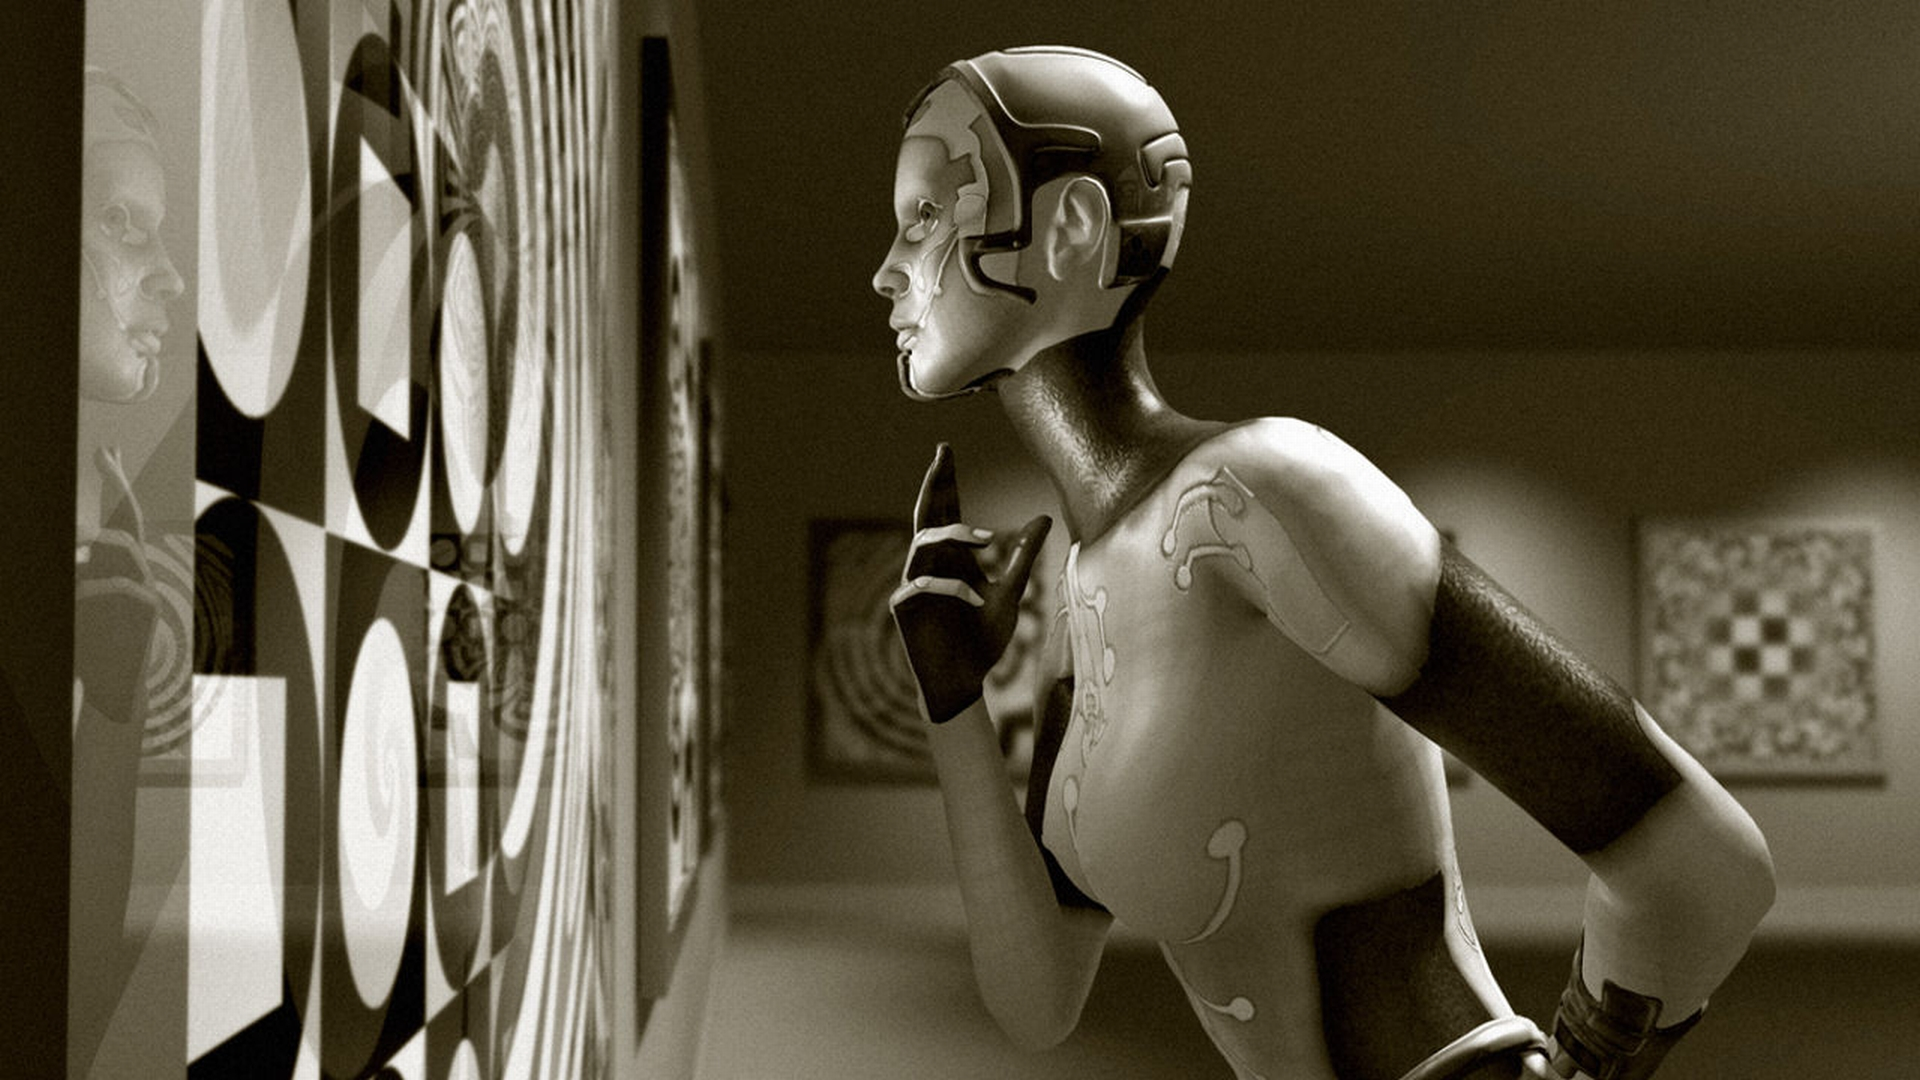 Cyborg Hd Wallpaper Background Image 1920x1080 Id 145972